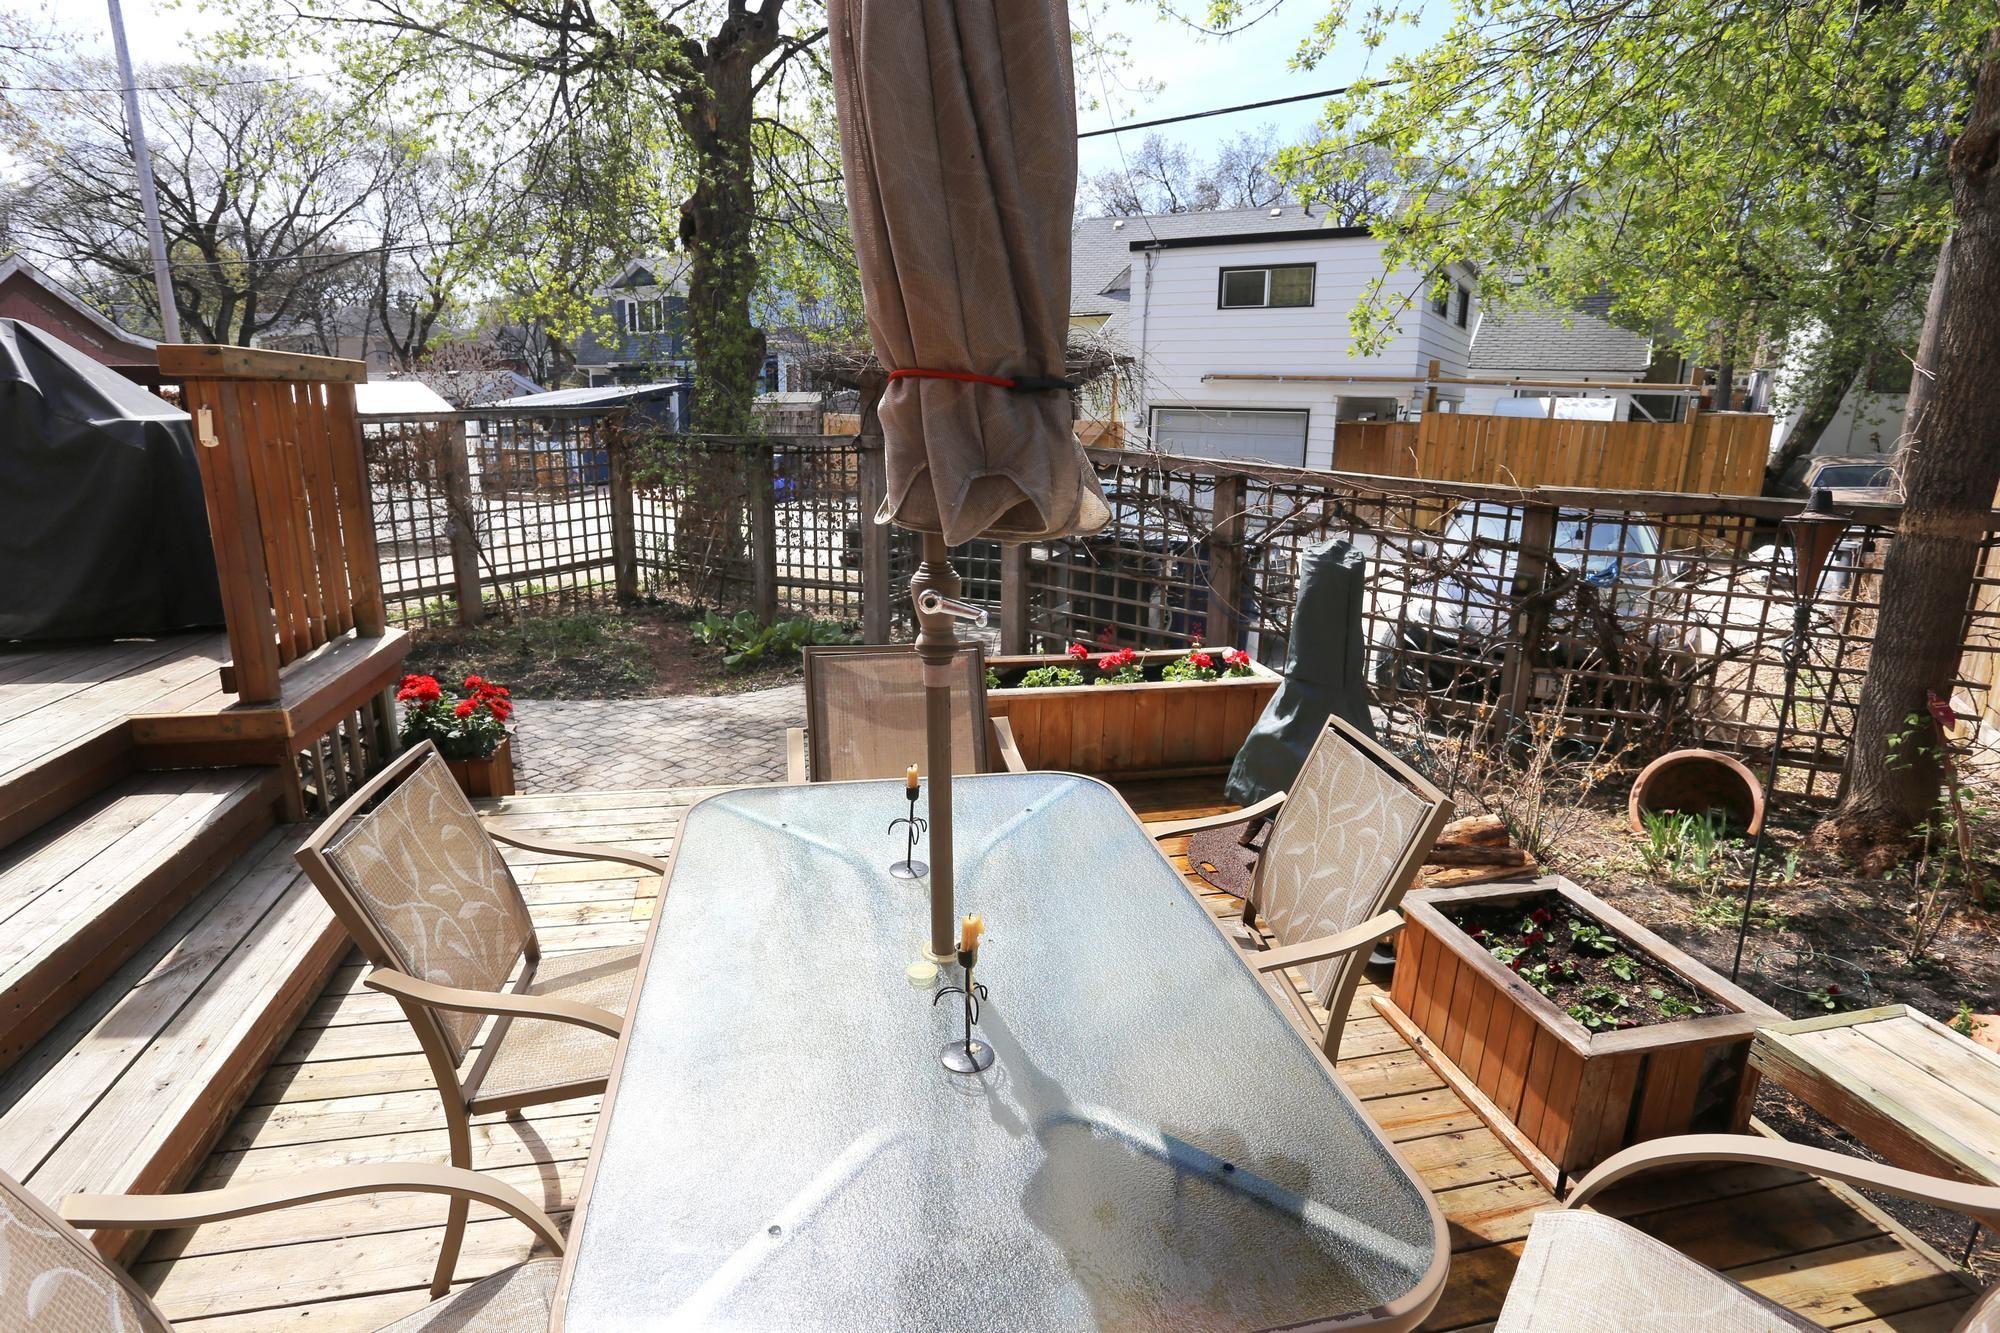 Photo 35: Photos: 96 Home Street in Winnipeg: Wolseley Single Family Detached for sale (5B)  : MLS®# 1810985